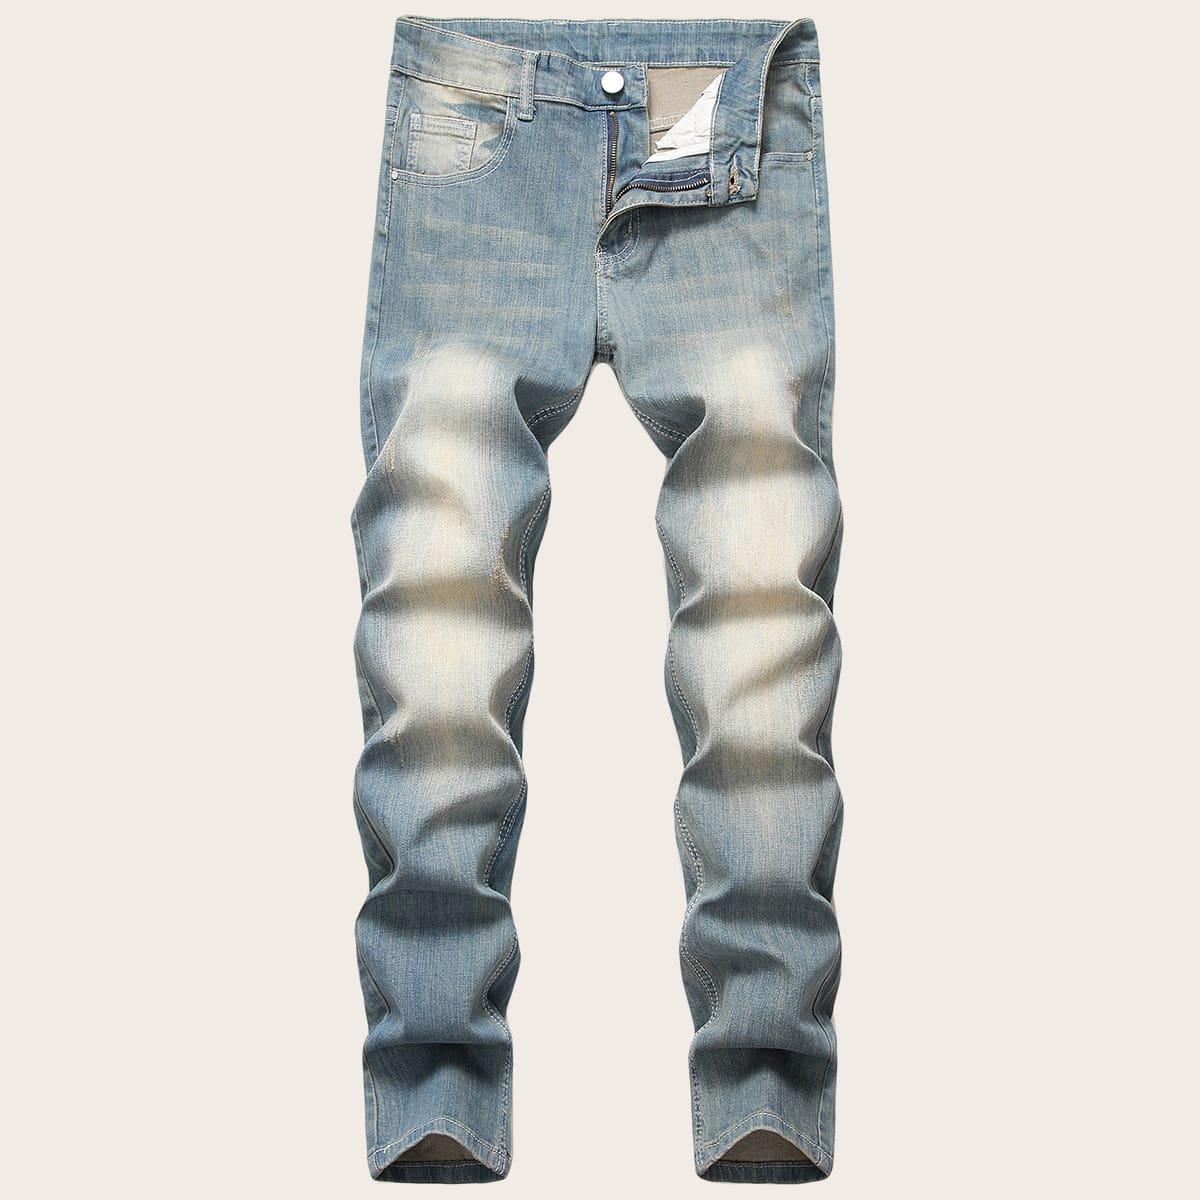 Blauw Casual Heren Jeans Gewassen